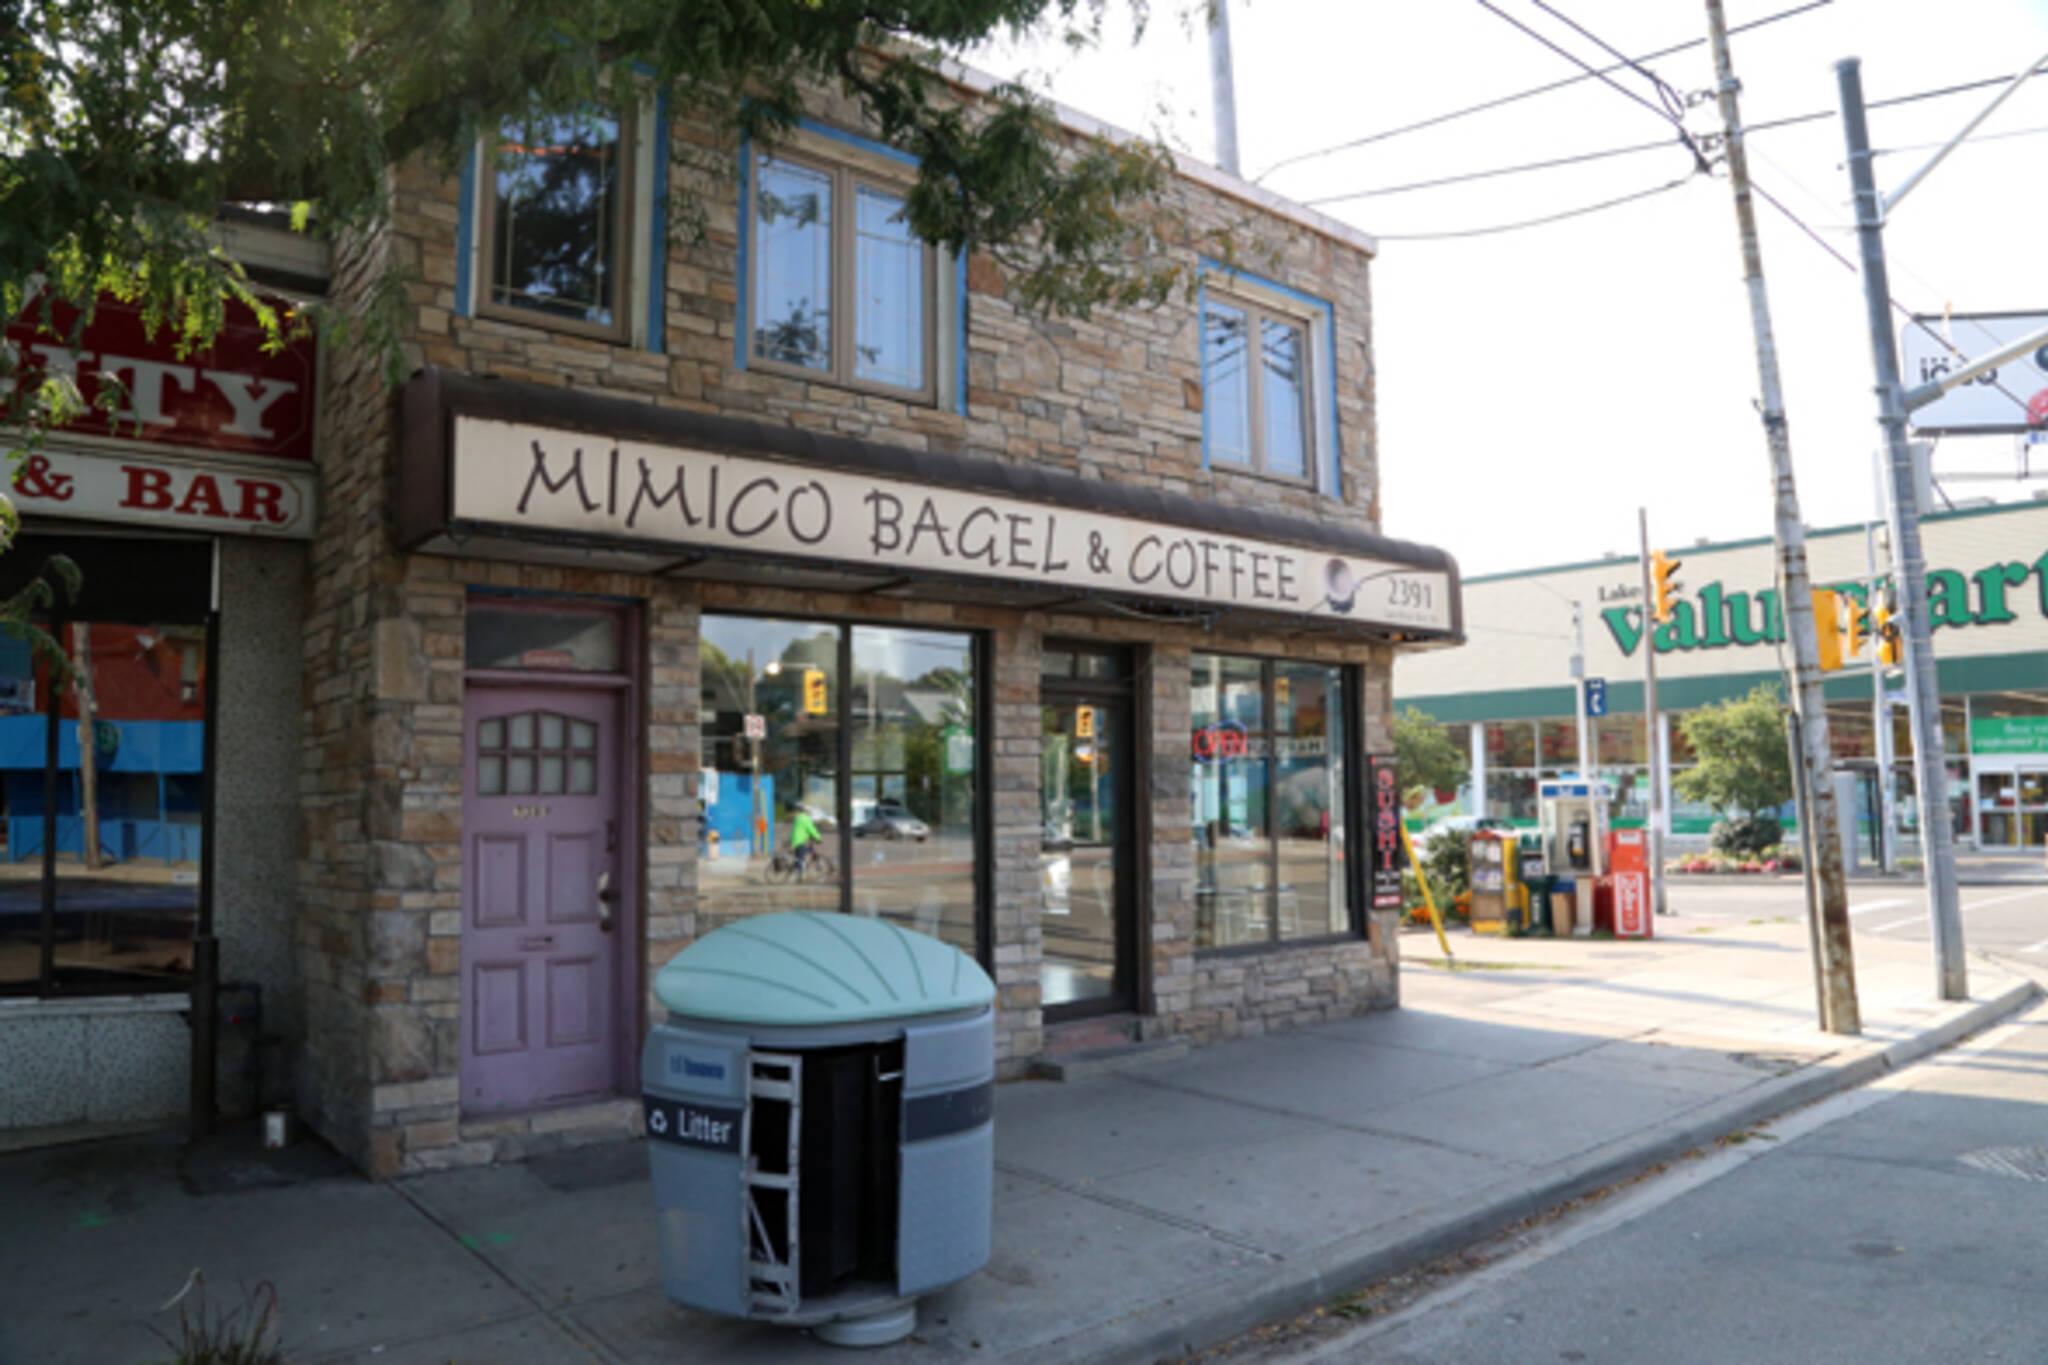 Mimico Bagel Coffee